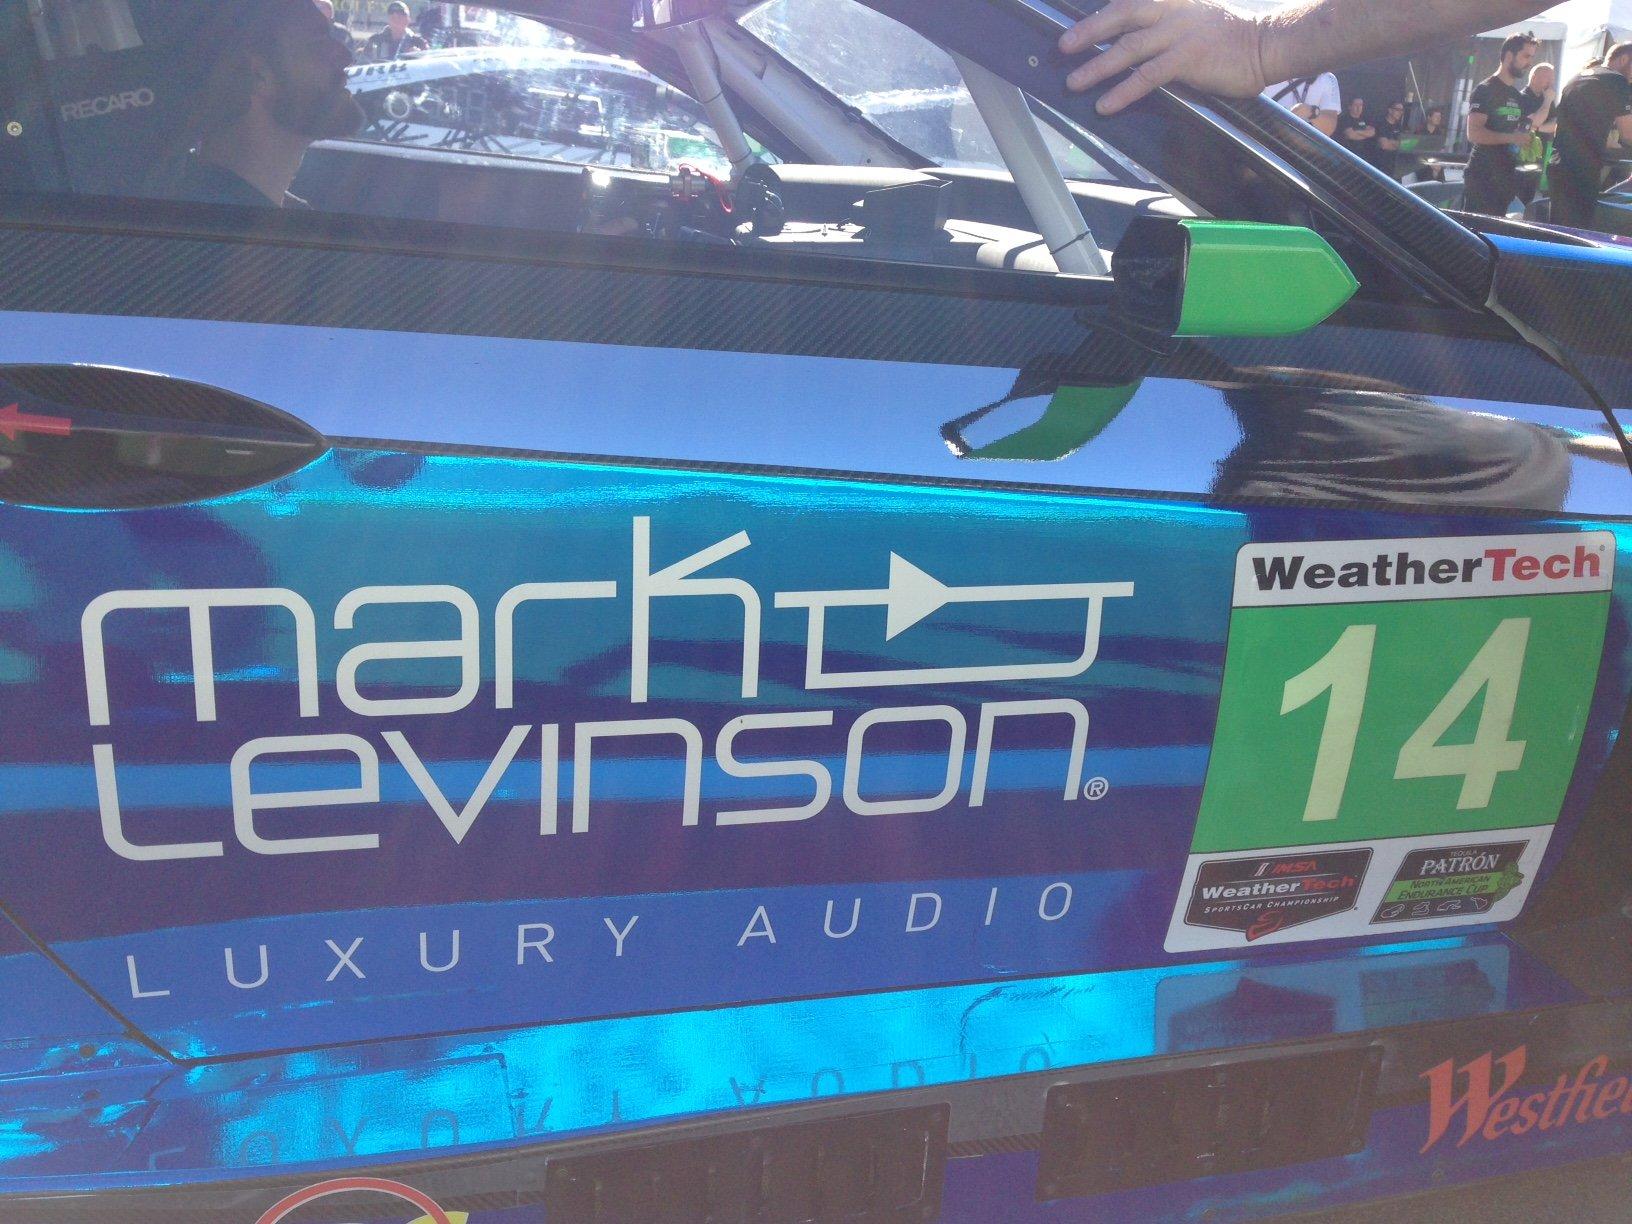 Mark Levinson Luxury Audio Lexus Photo